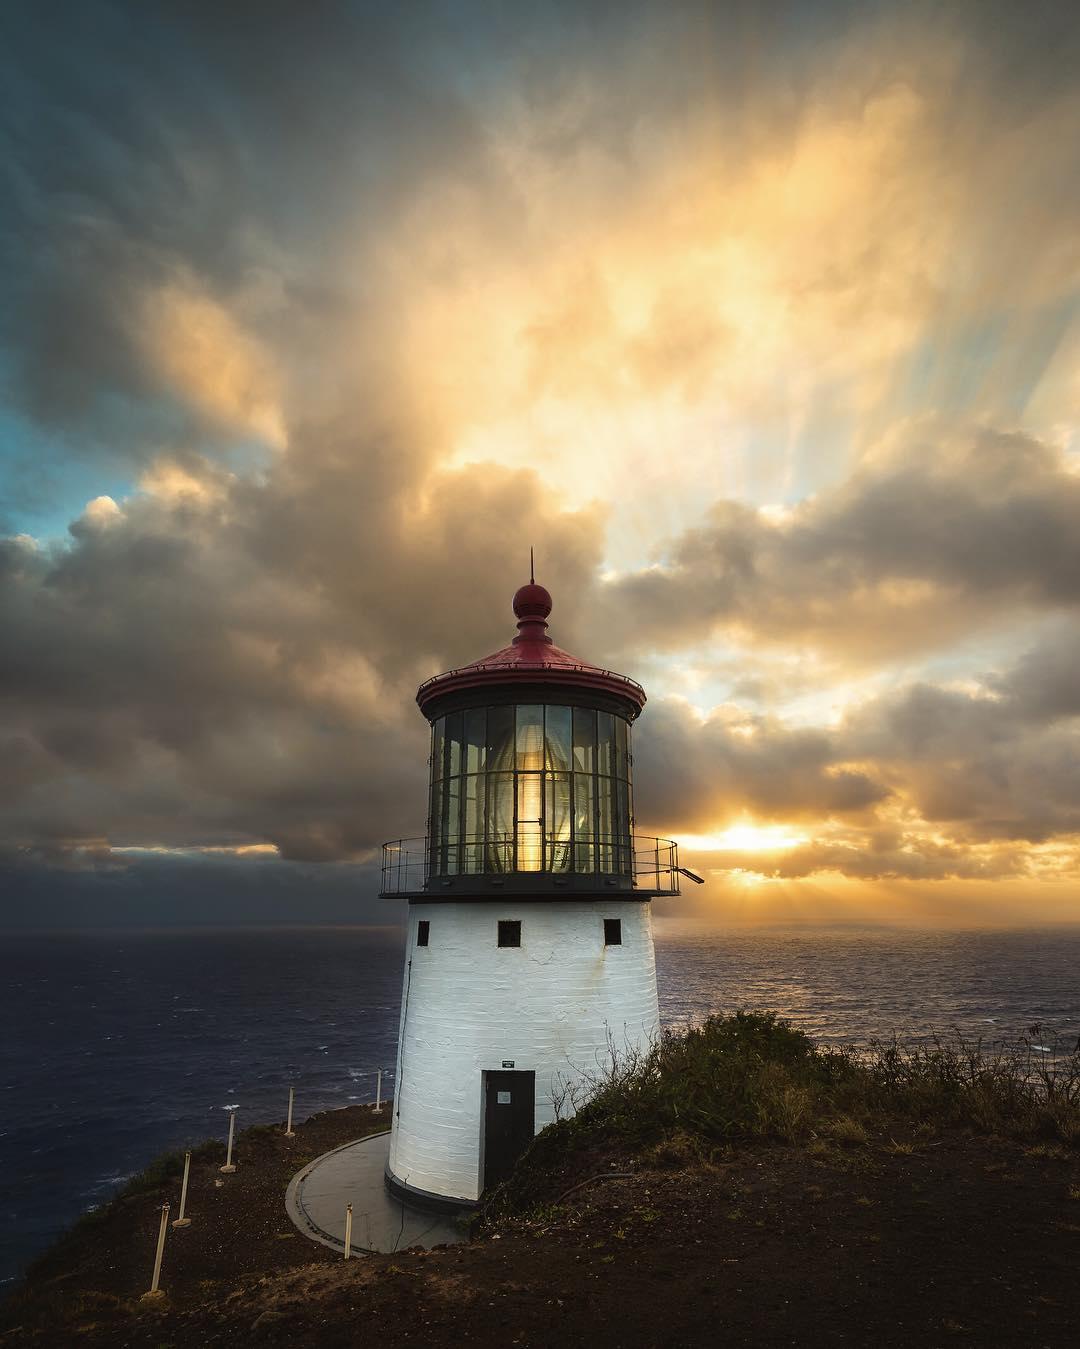 Makapu'u Lighthouse Viewpoint - #14 on the 15 Best Hikes on Oahu